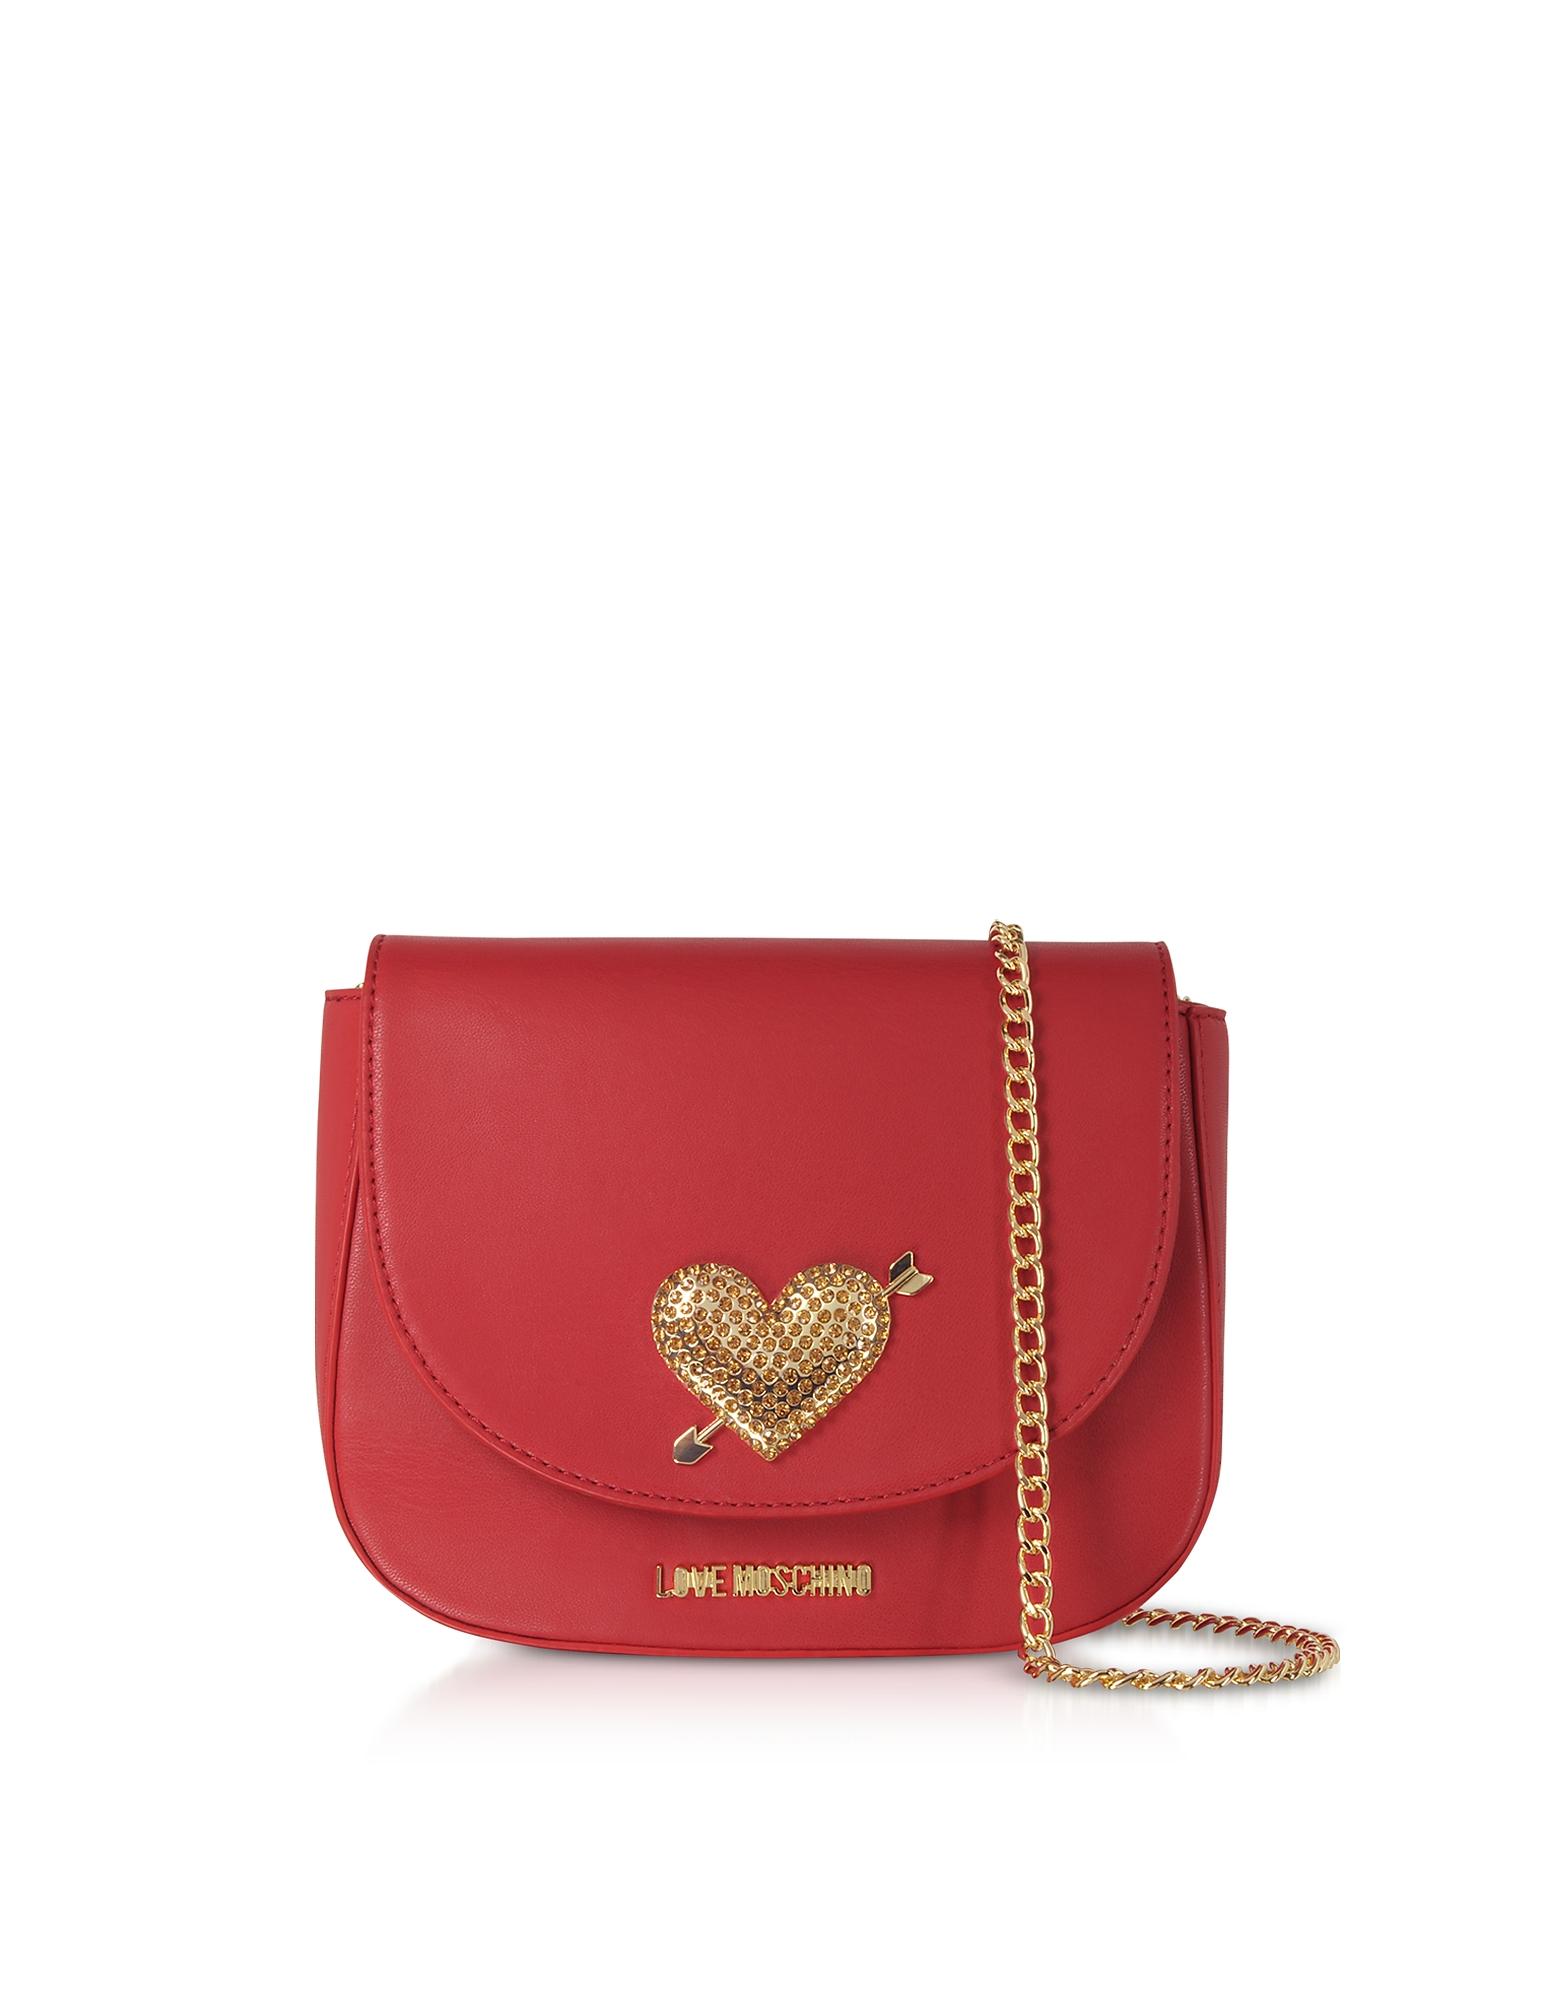 LOVE MOSCHINO Evening Bag Crossbody W/Strass in Red